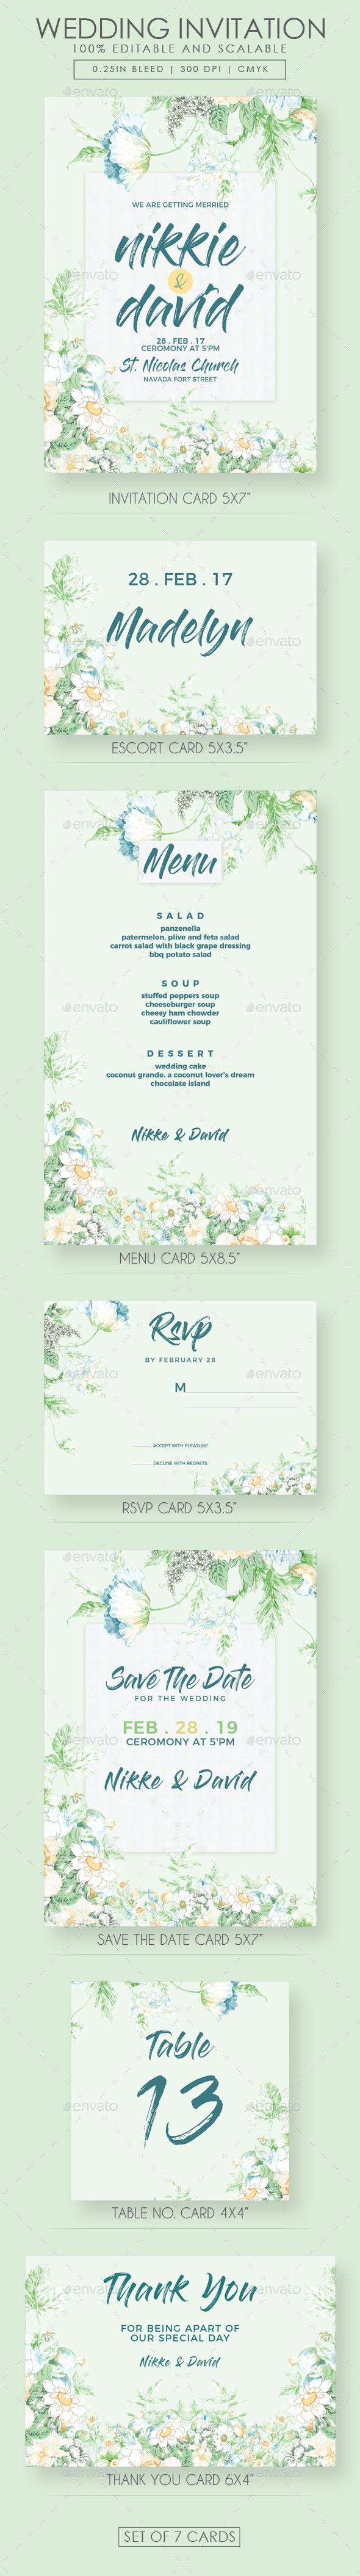 Floral Wedding Invitation Suite - Weddings Cards & Invites